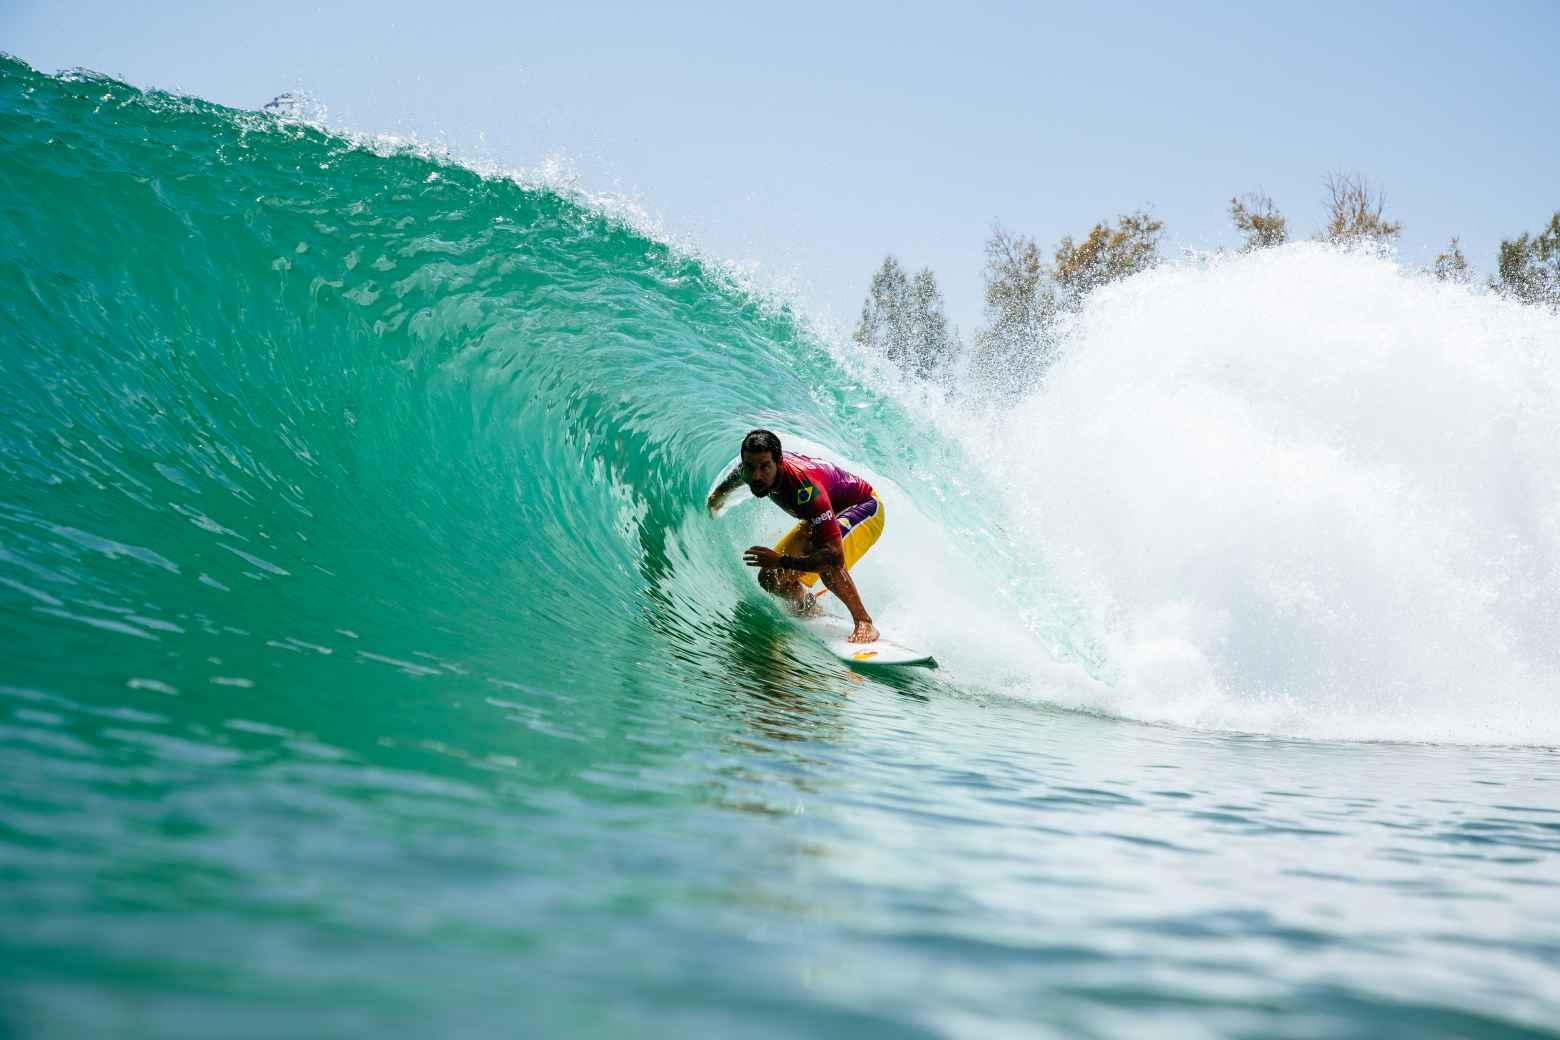 surf30 surf ranch pro 2021 wsl surf DeSouza A Ranch21 THF1644